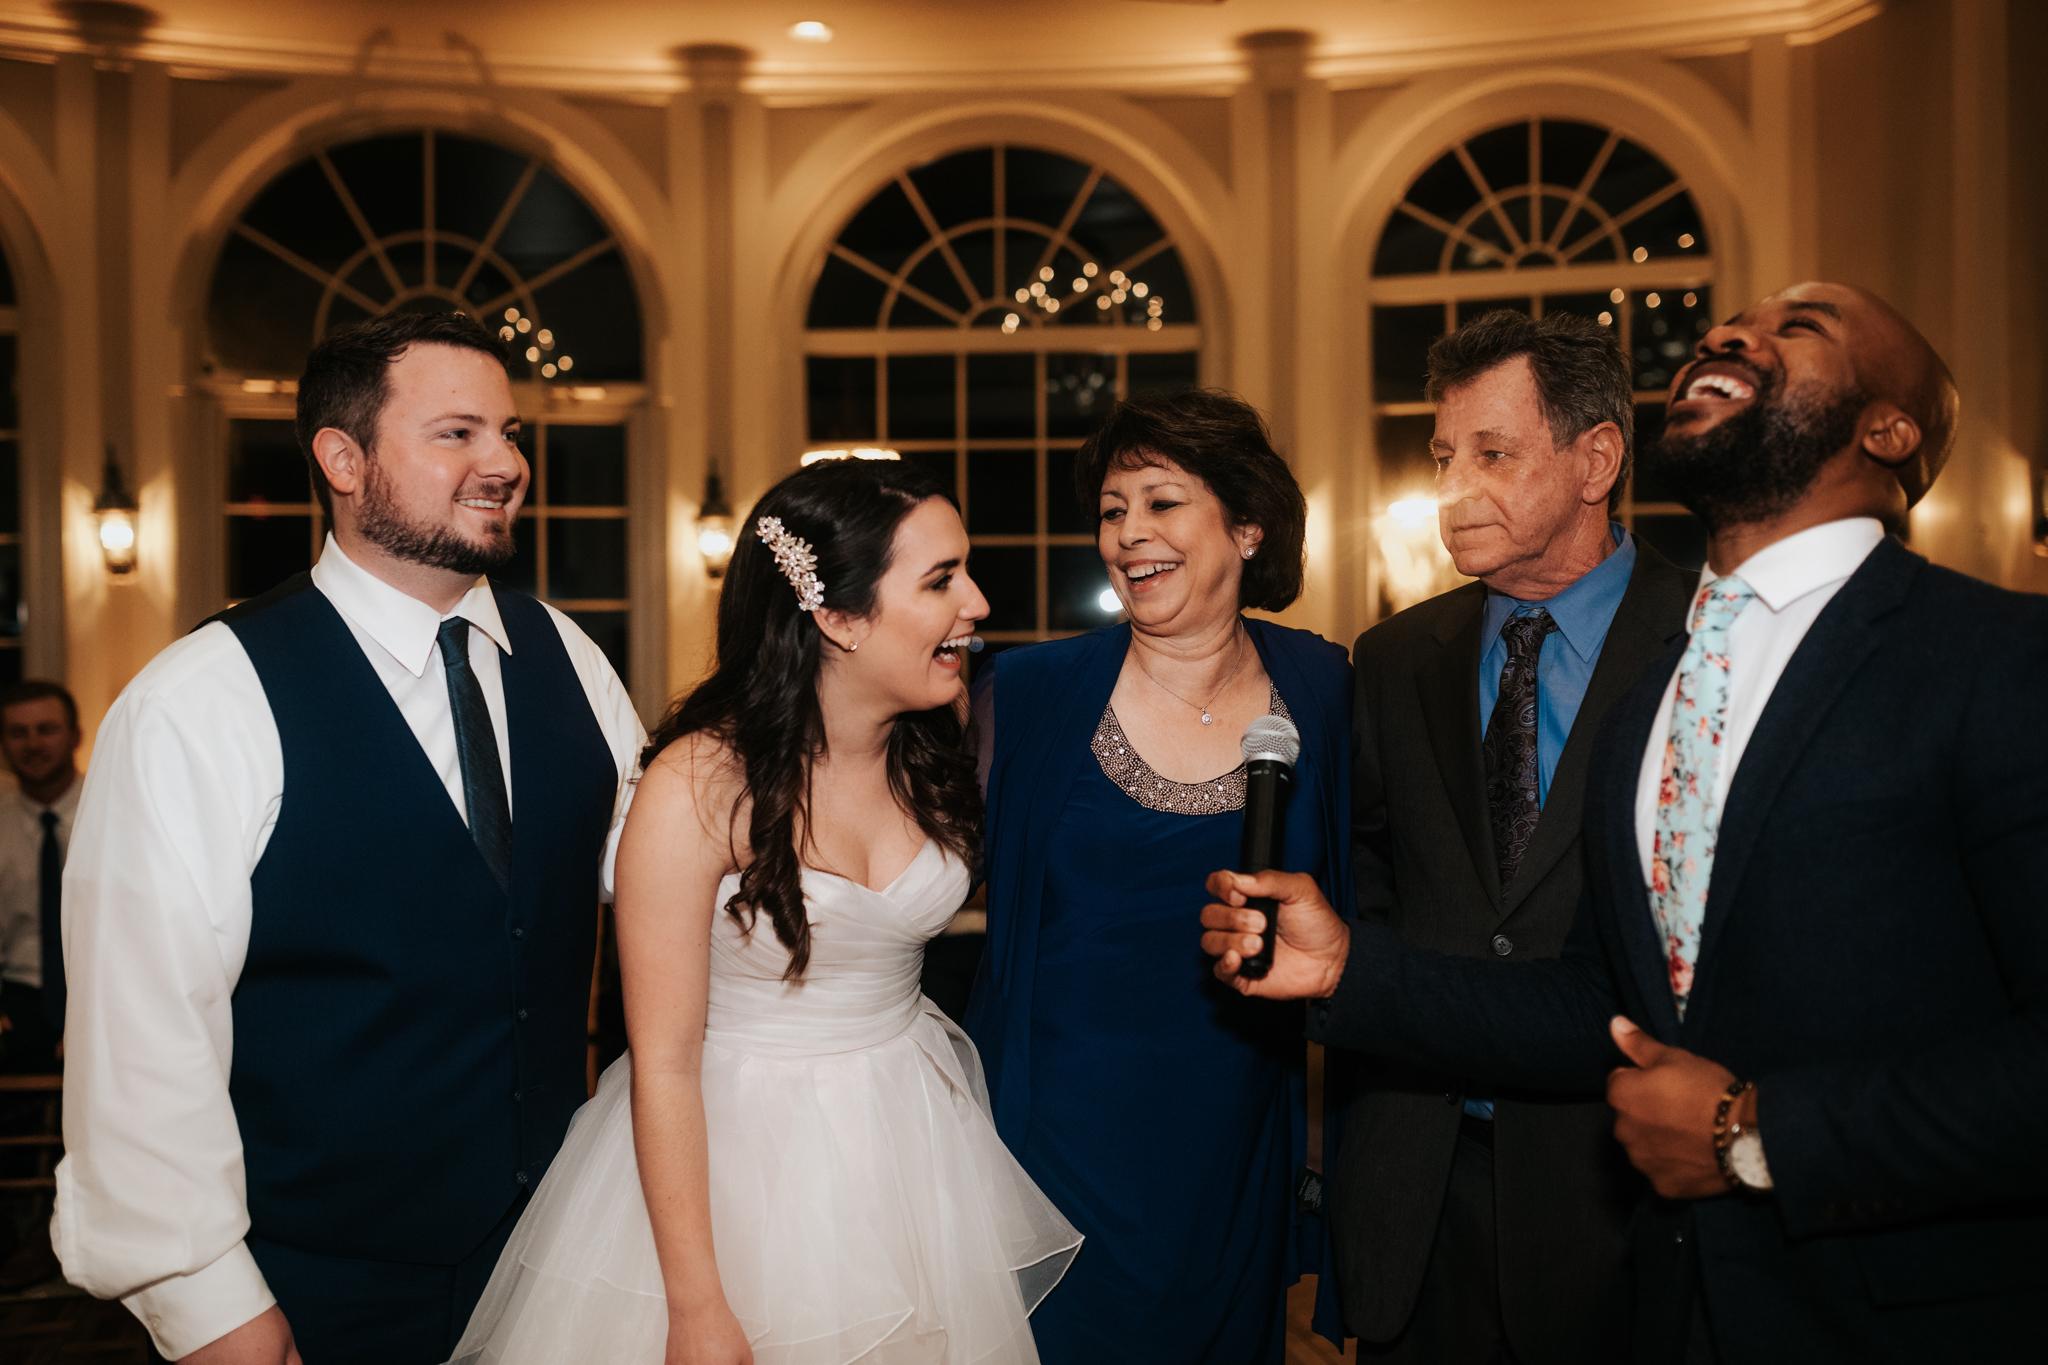 Leah Nicole Photography - Houston Wedding Photographer-Lake Conroe Wedding- Houston Wedding Photographer-47.jpg